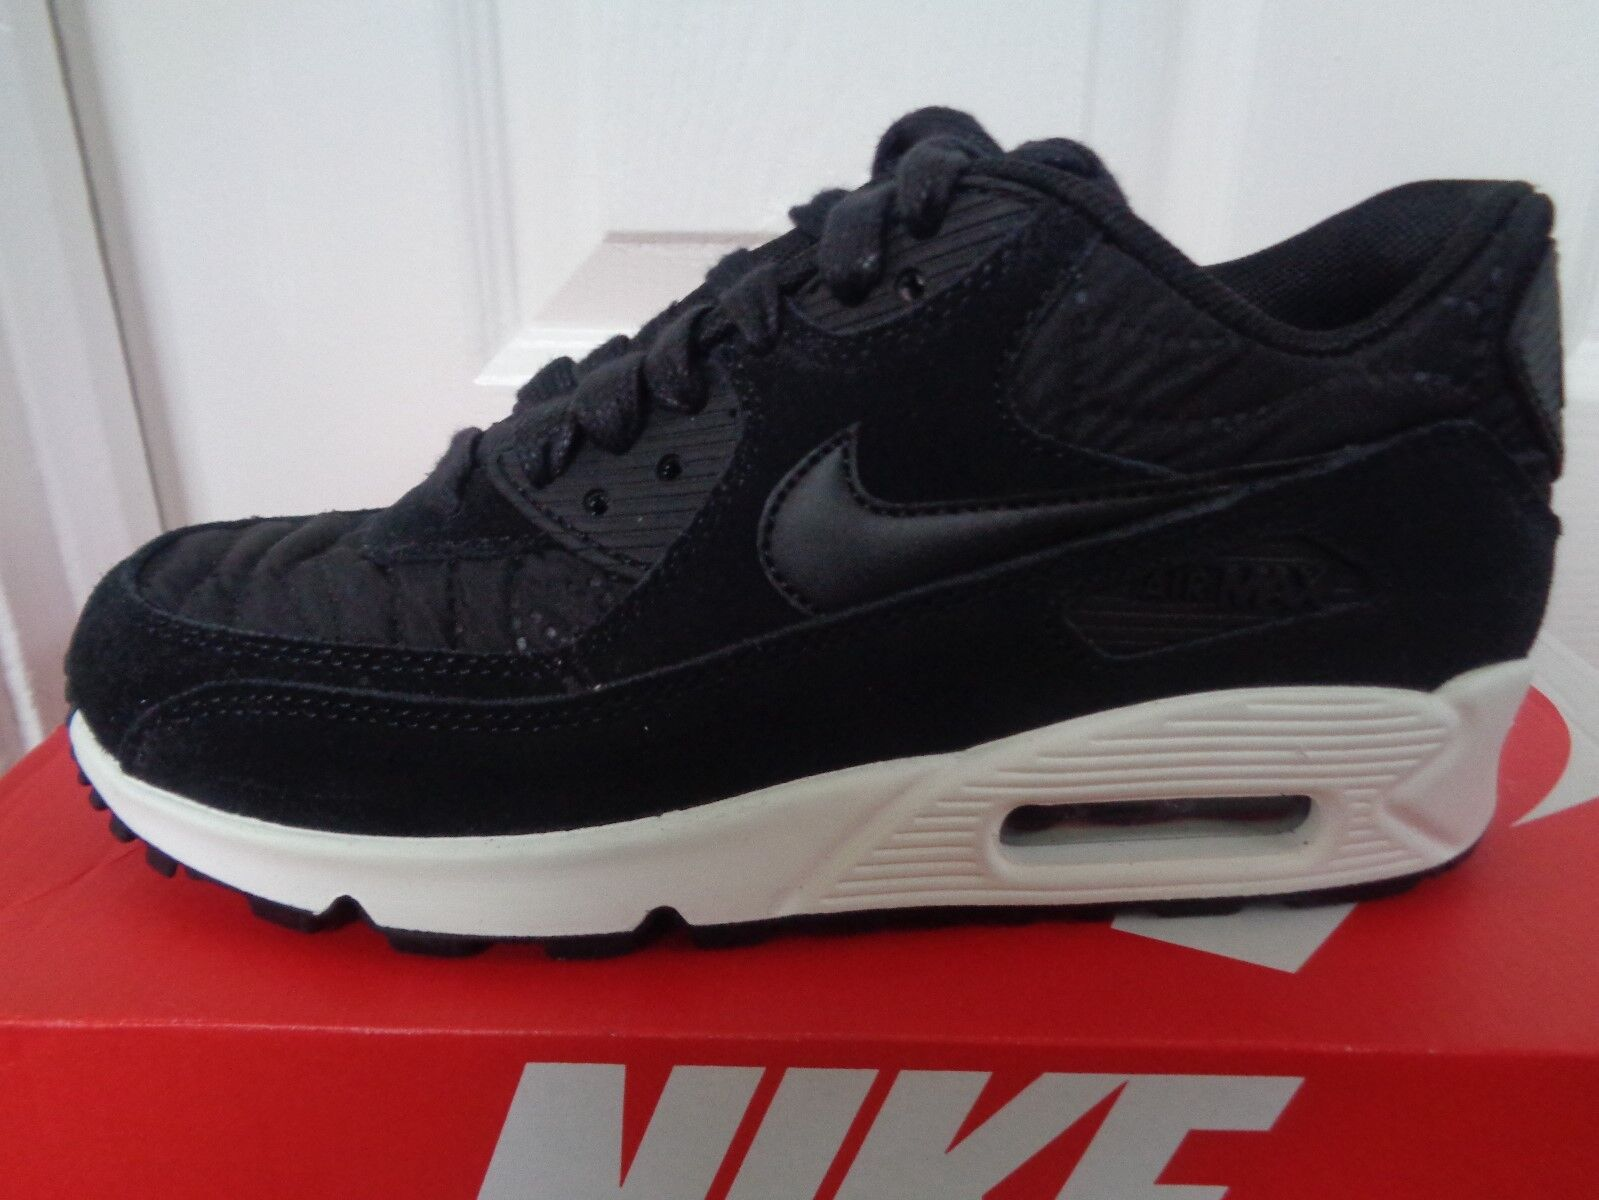 Nike Air Max 90 Prem Femme trainers 443817 009 uk 4 eu 37.5 us 6.5 NEW+BOX